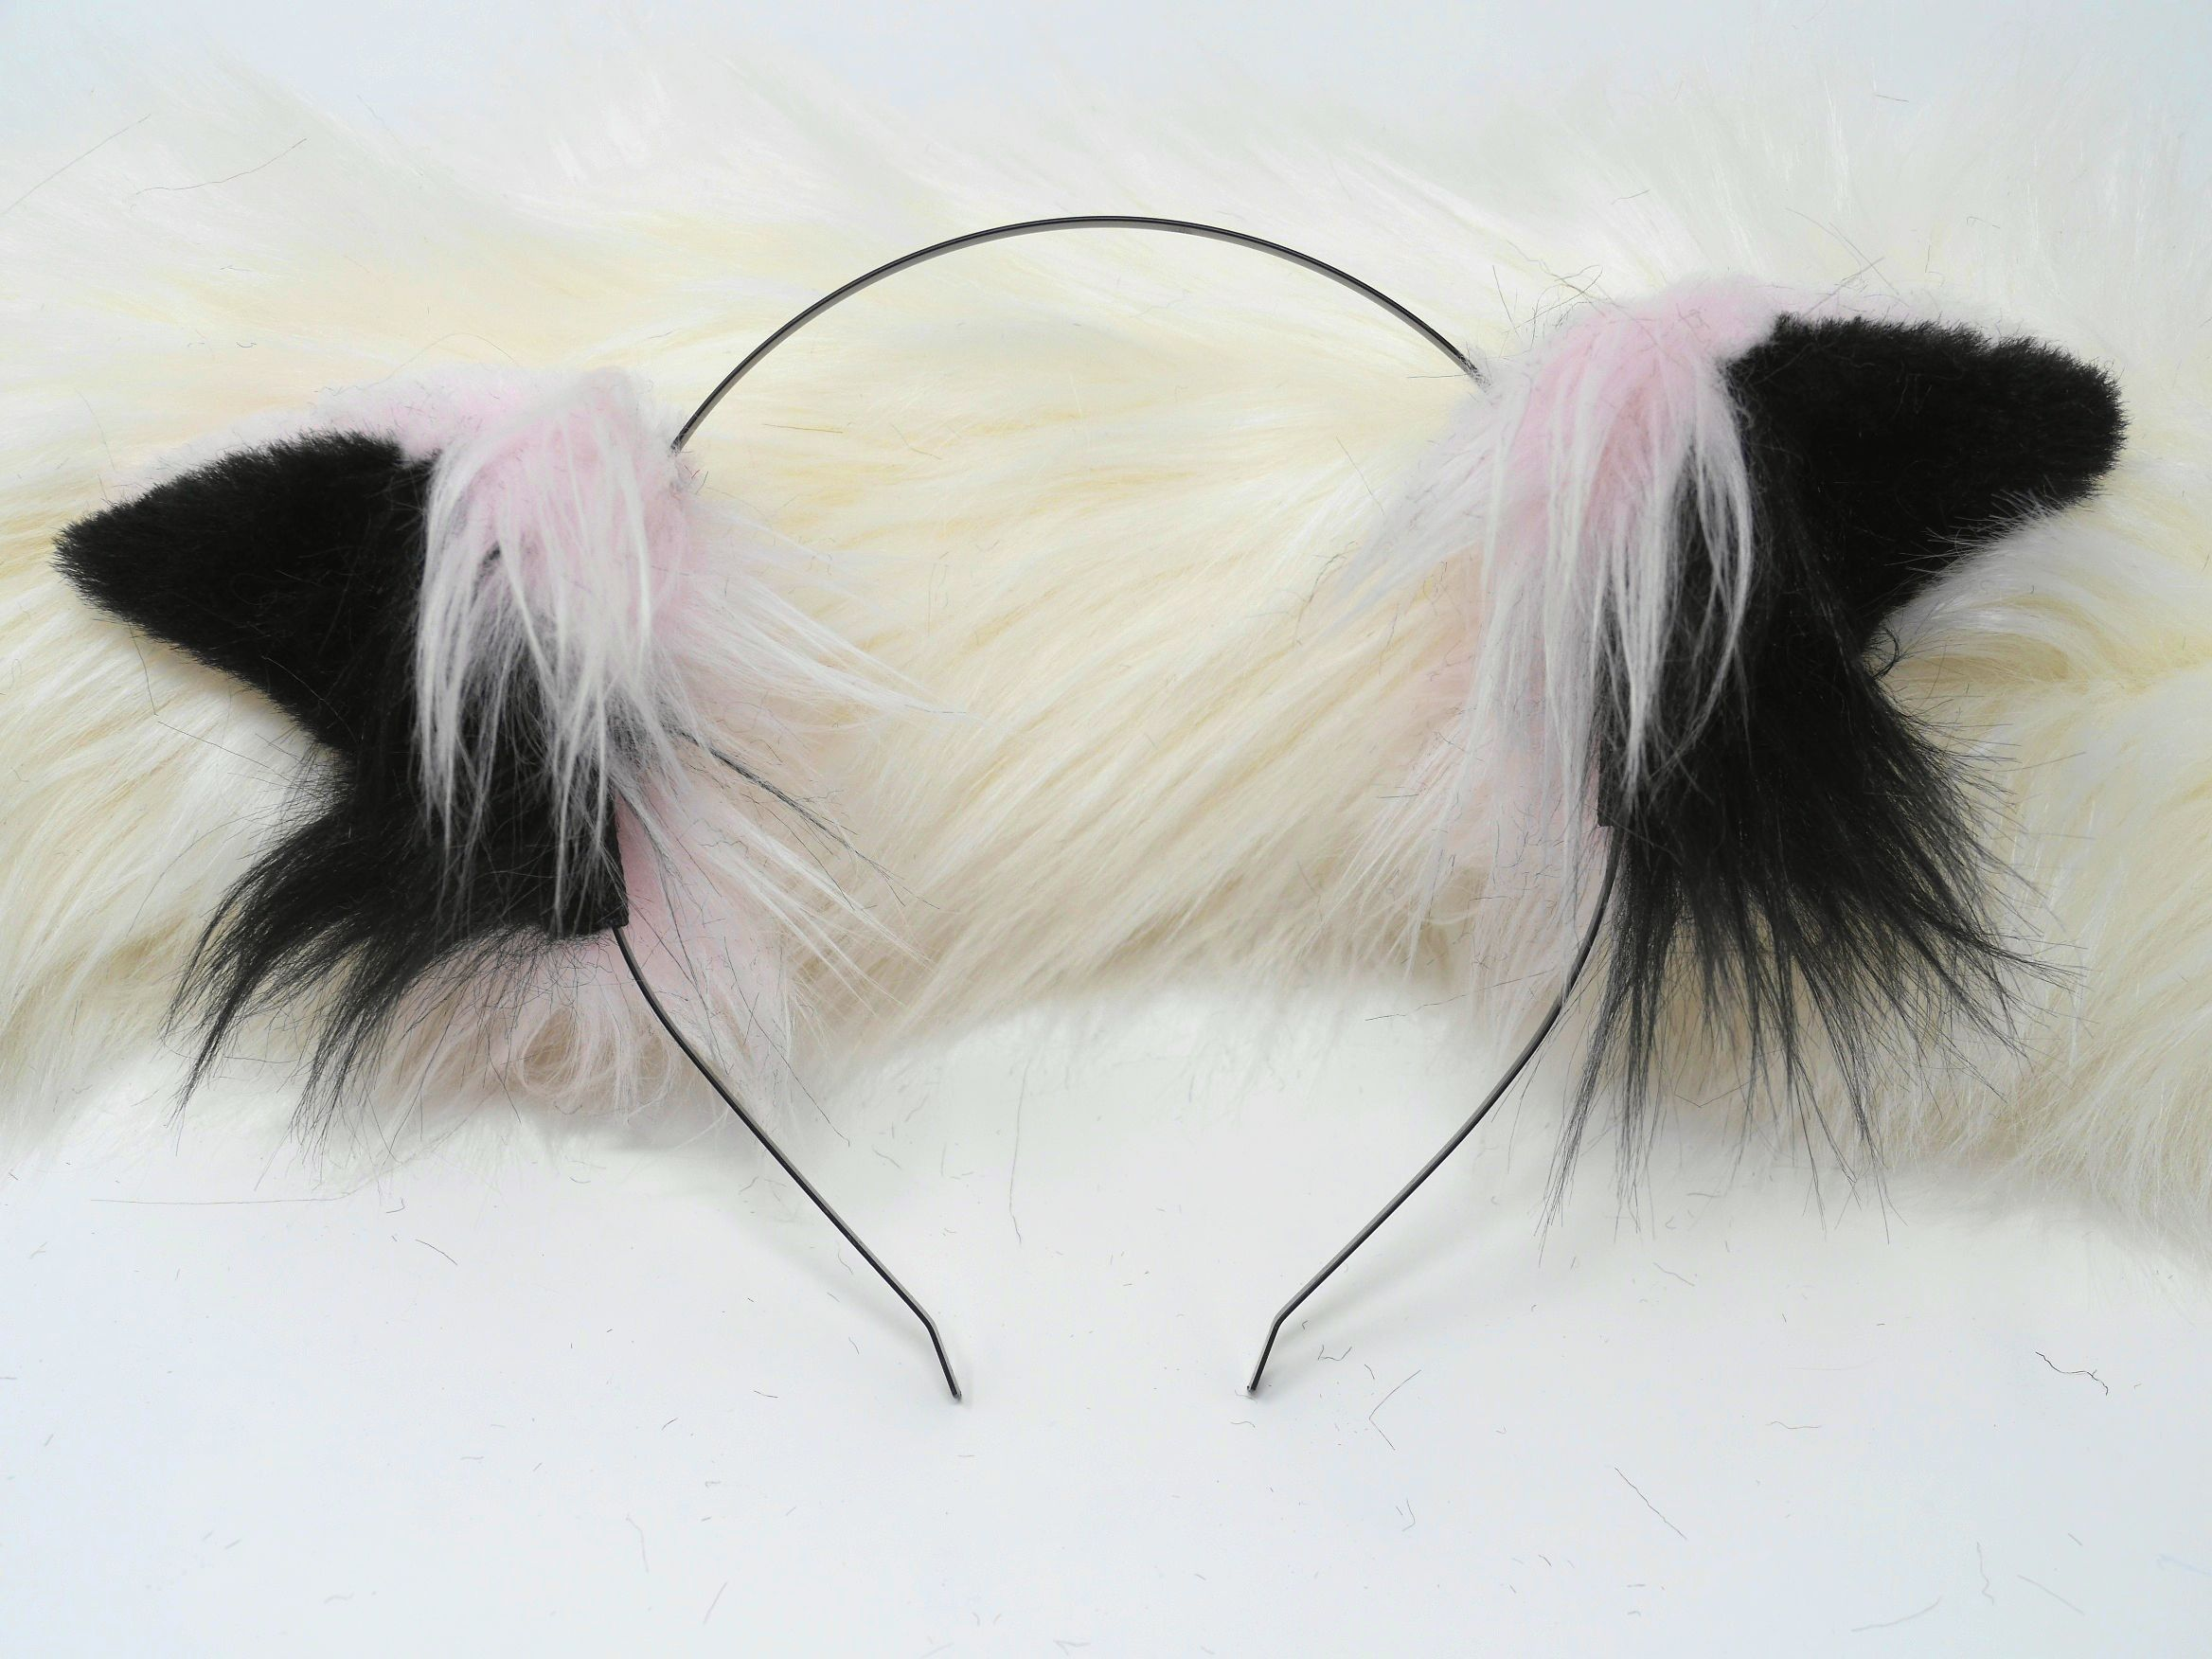 Pink and Black Cosplay Neko Girl Ears Kitten Play Cat Girl